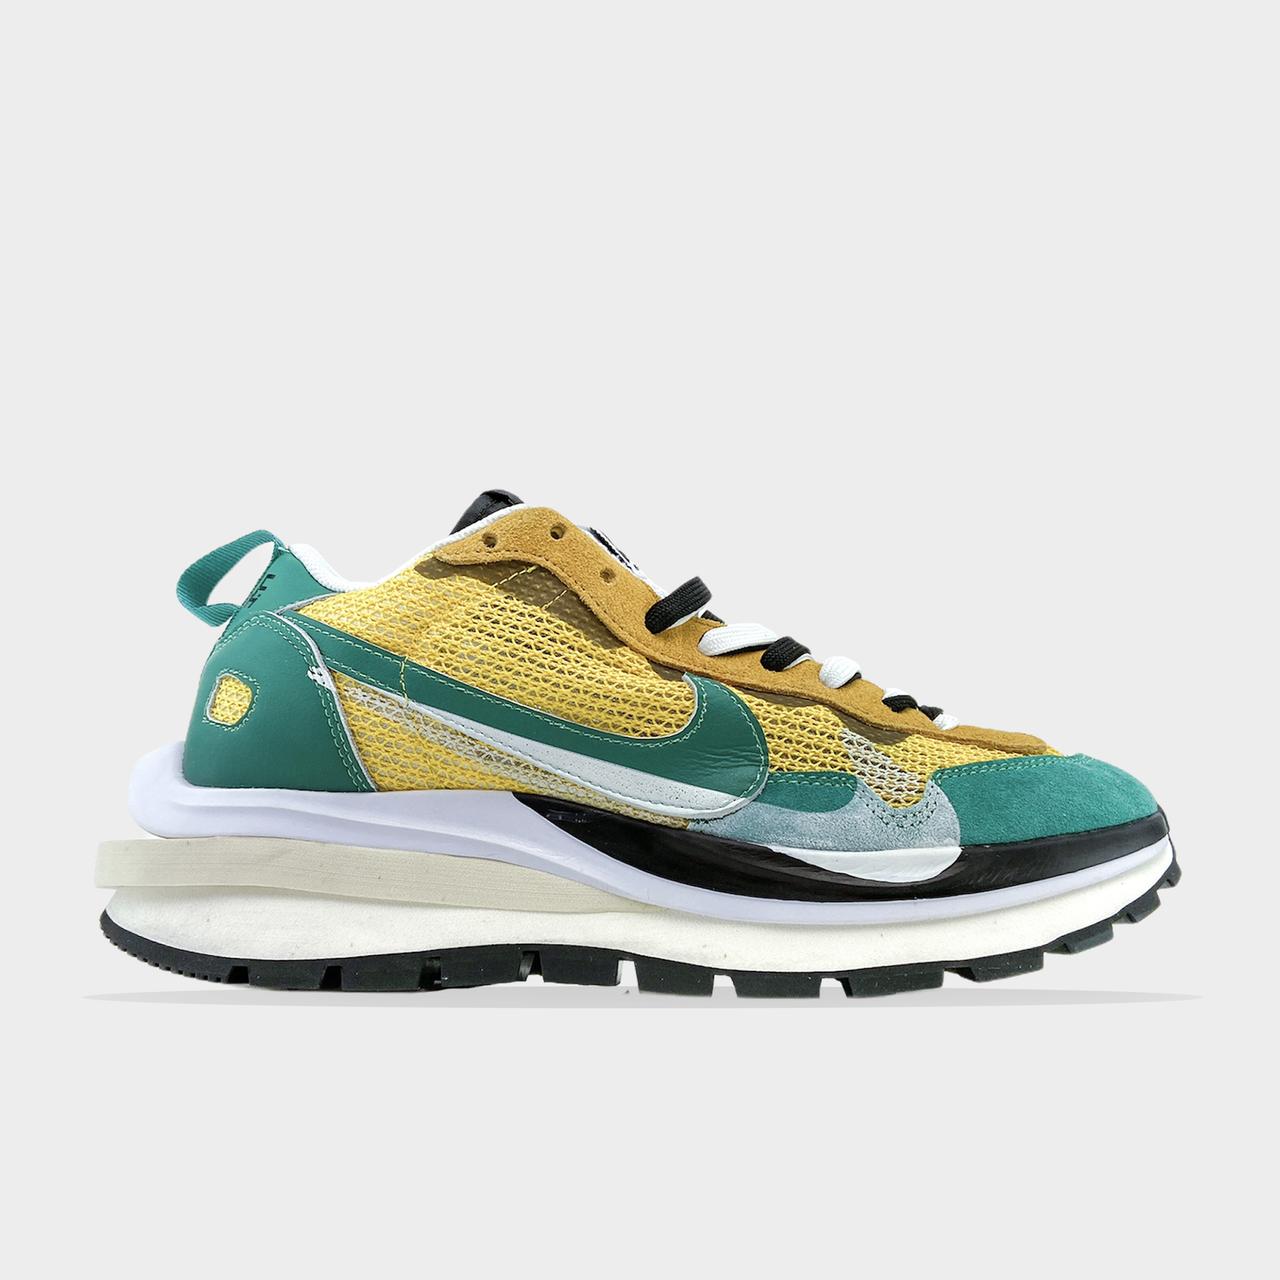 Nk, крос, обувь, взуття, sneakers, шузы, x Sacai VaporWaffle Green Yellow (Желтый)